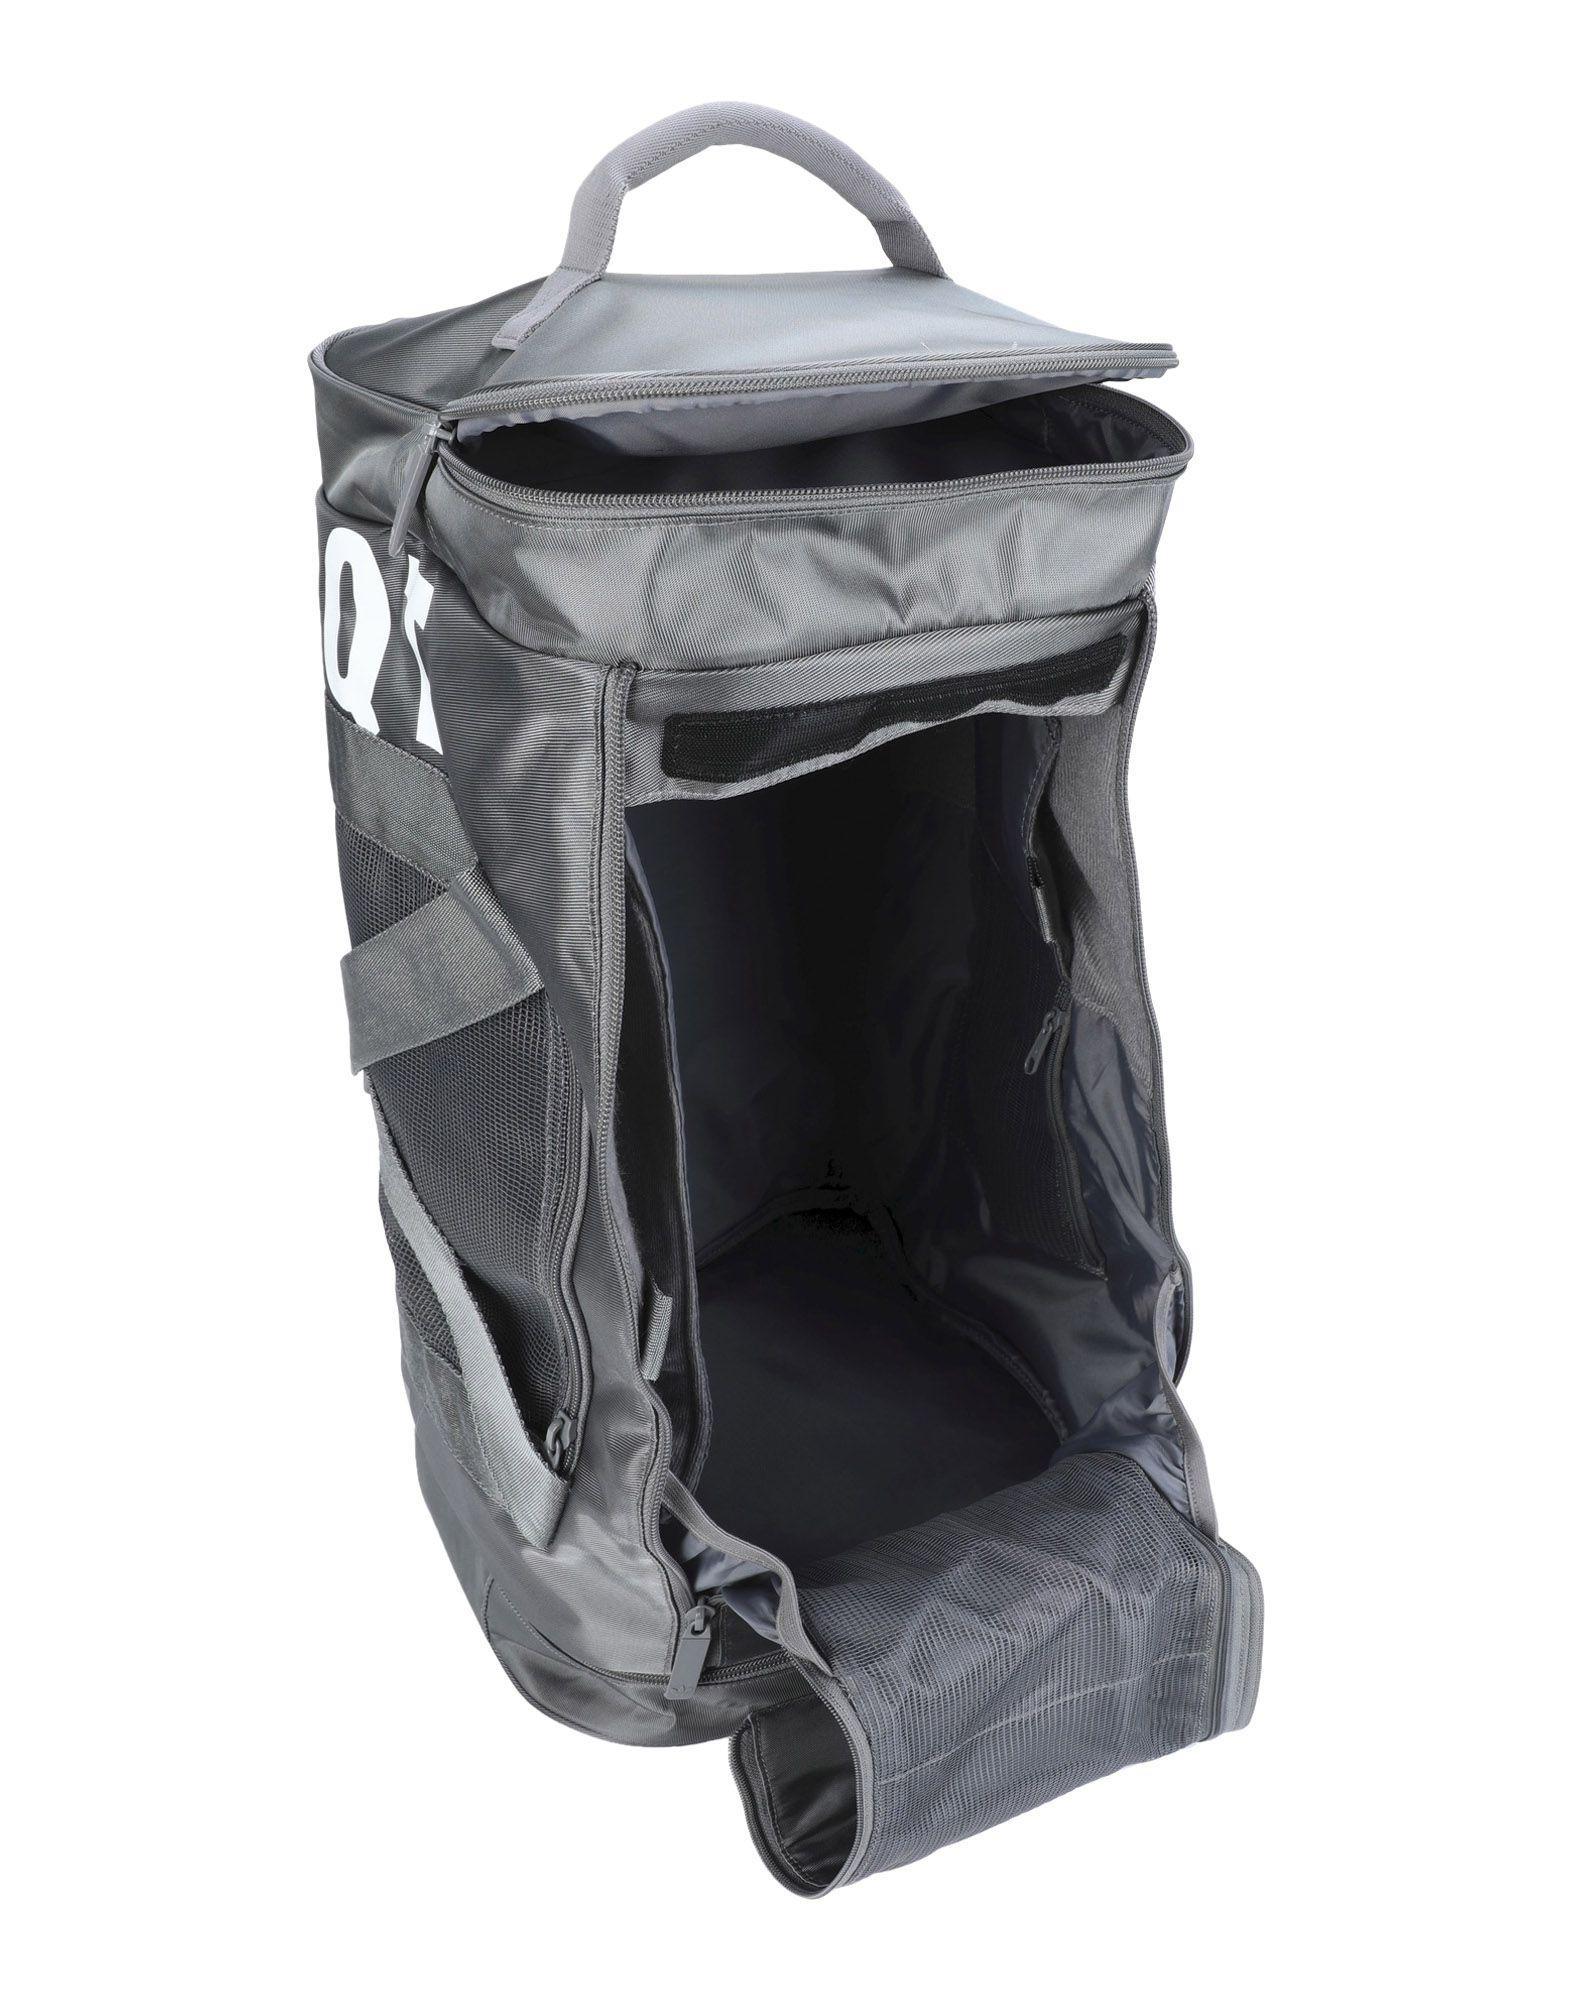 6b4f49e8b0 Lyst - adidas Originals Backpacks   Fanny Packs in Gray for Men